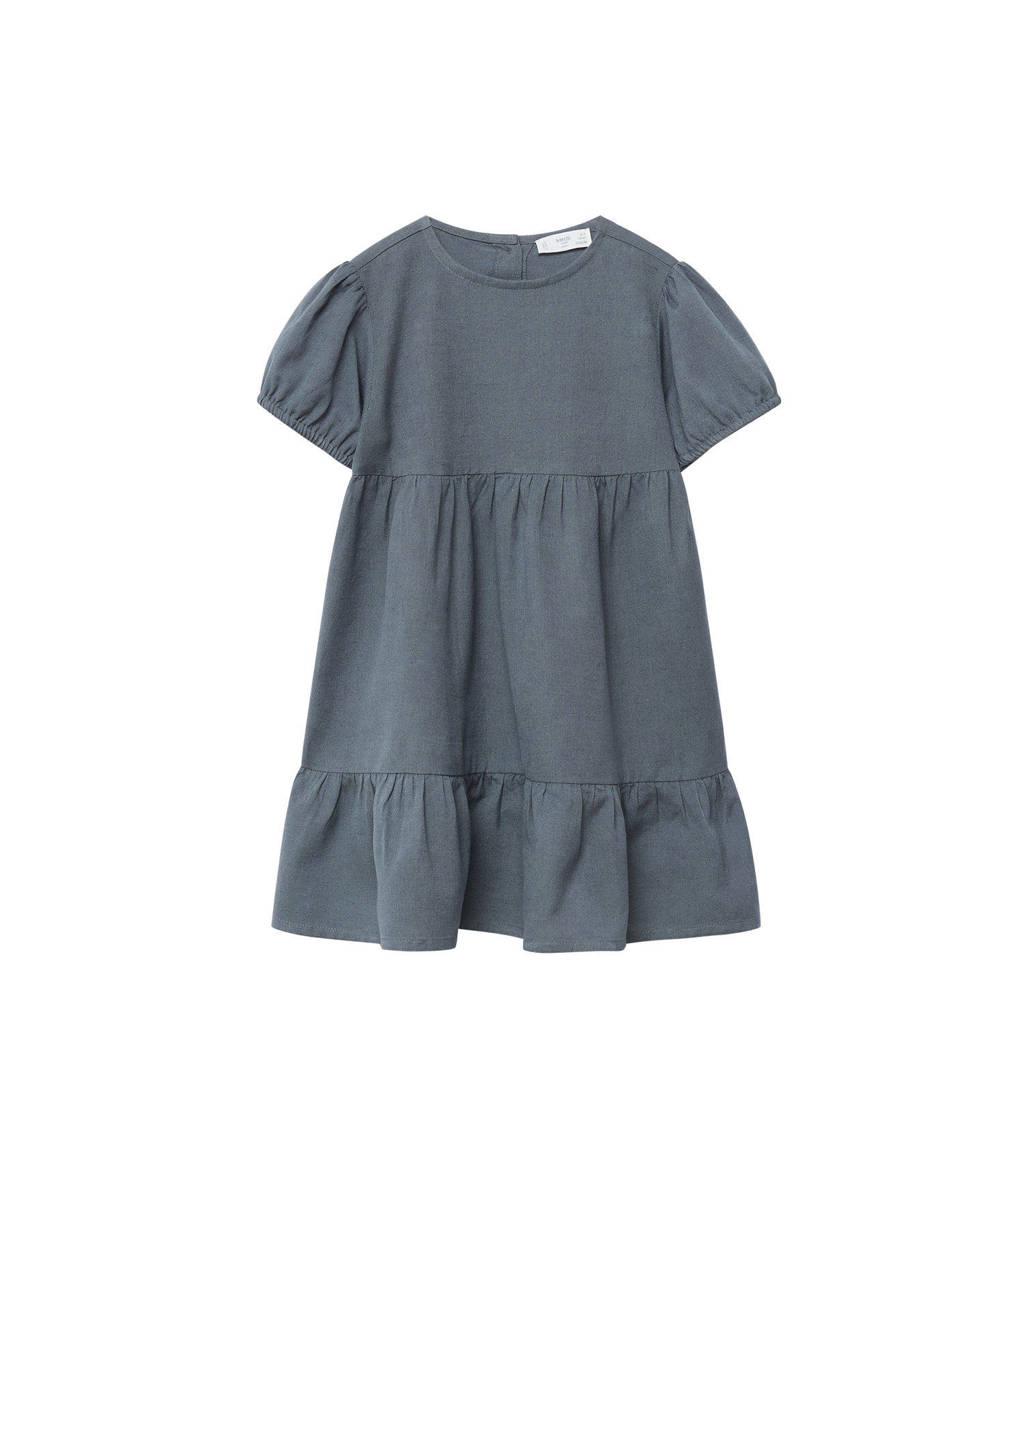 Mango Kids A-lijn jurk met volant donkergrijs, Donkergrijs